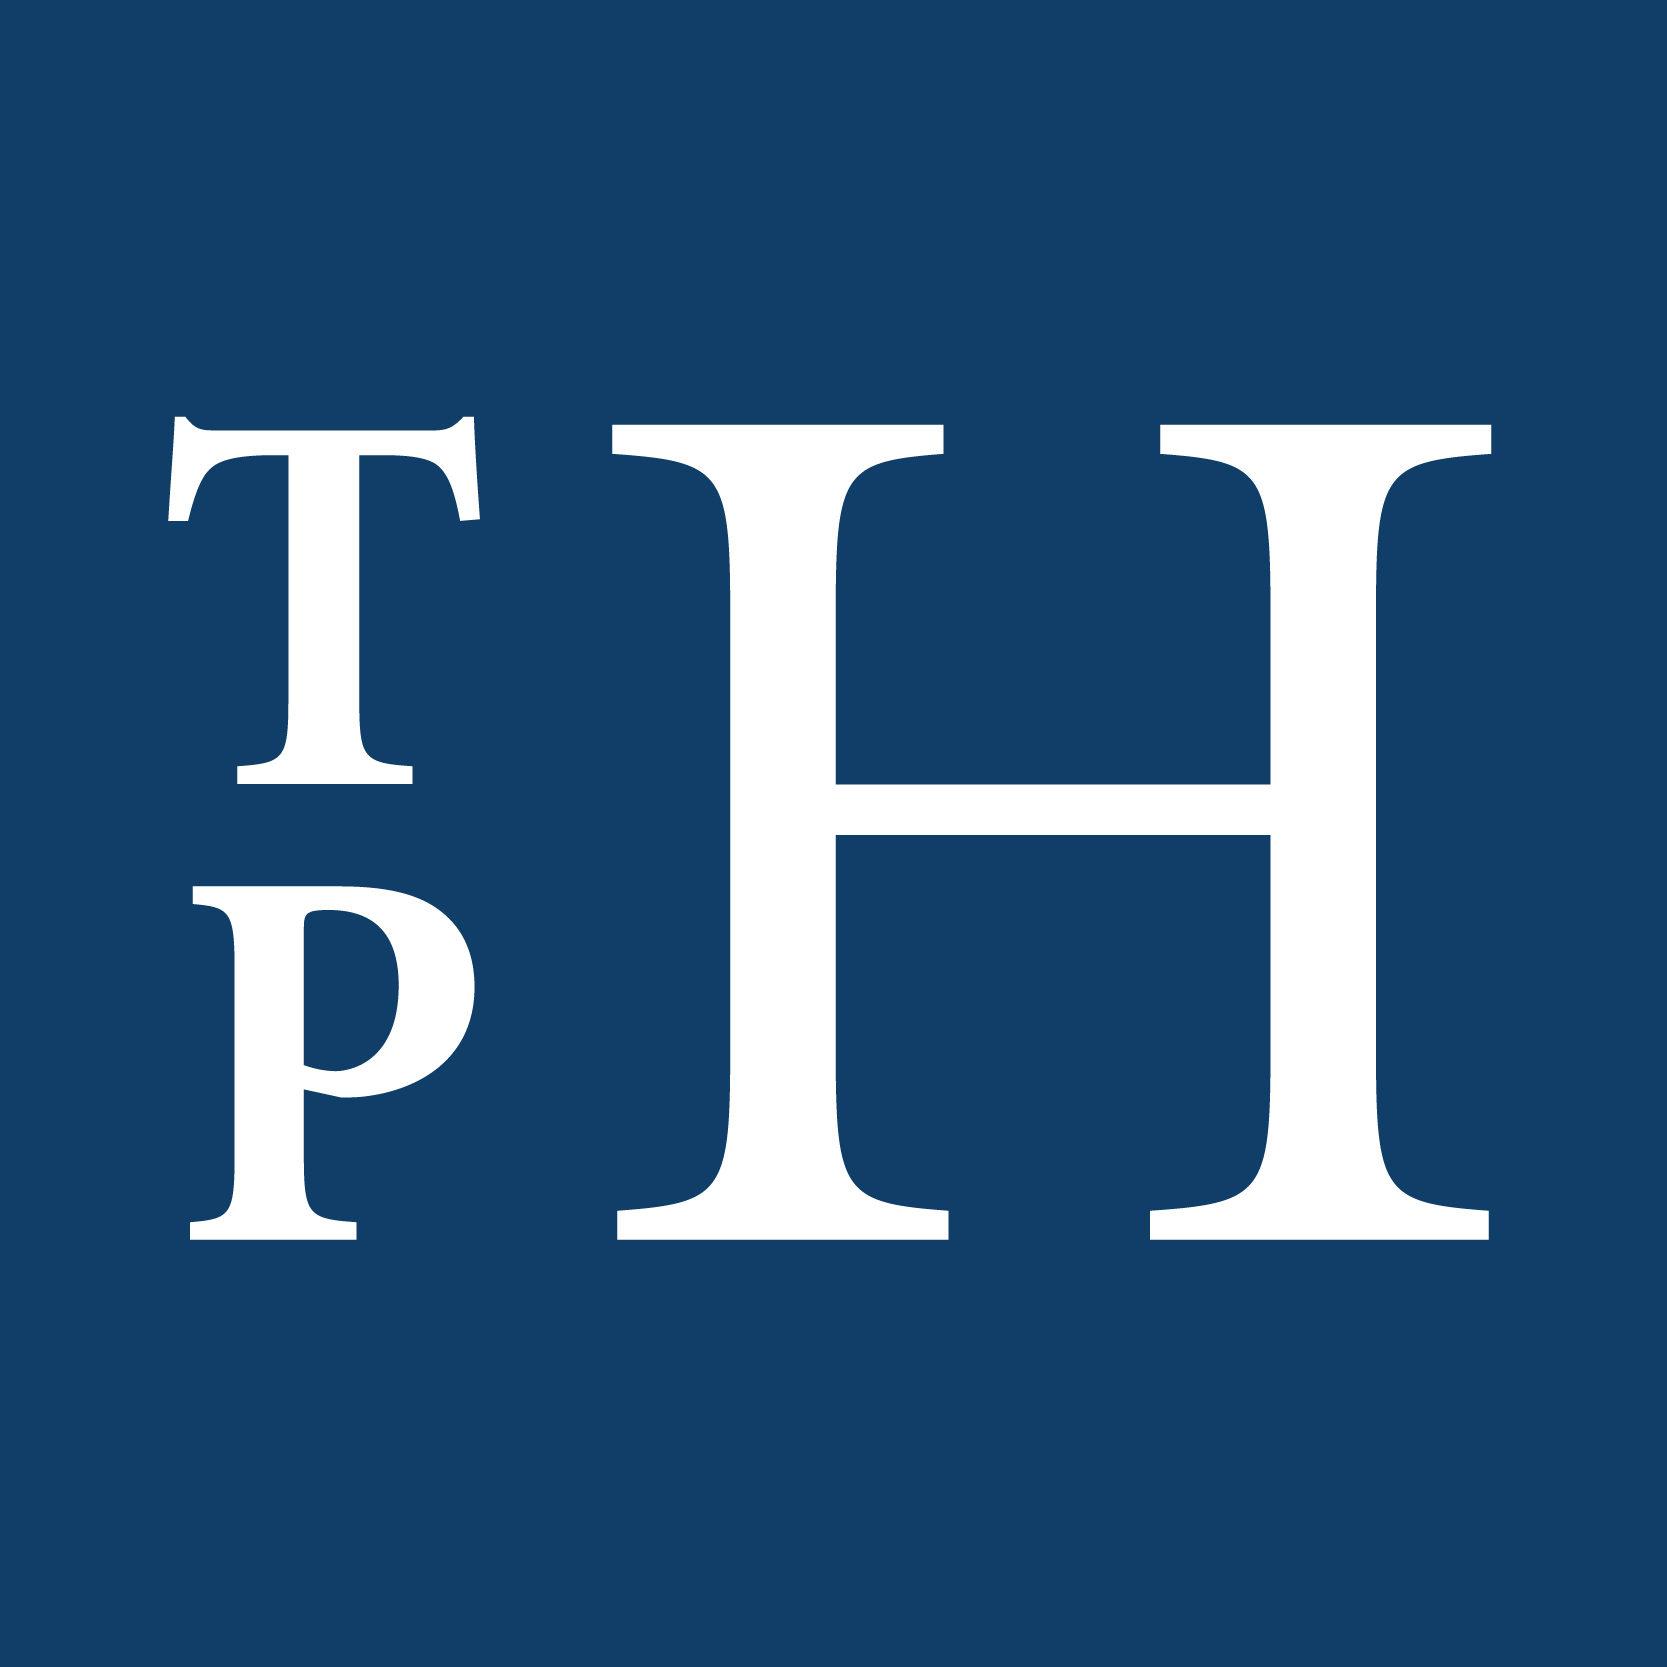 THL Logos 2018 05 01 square blue 01